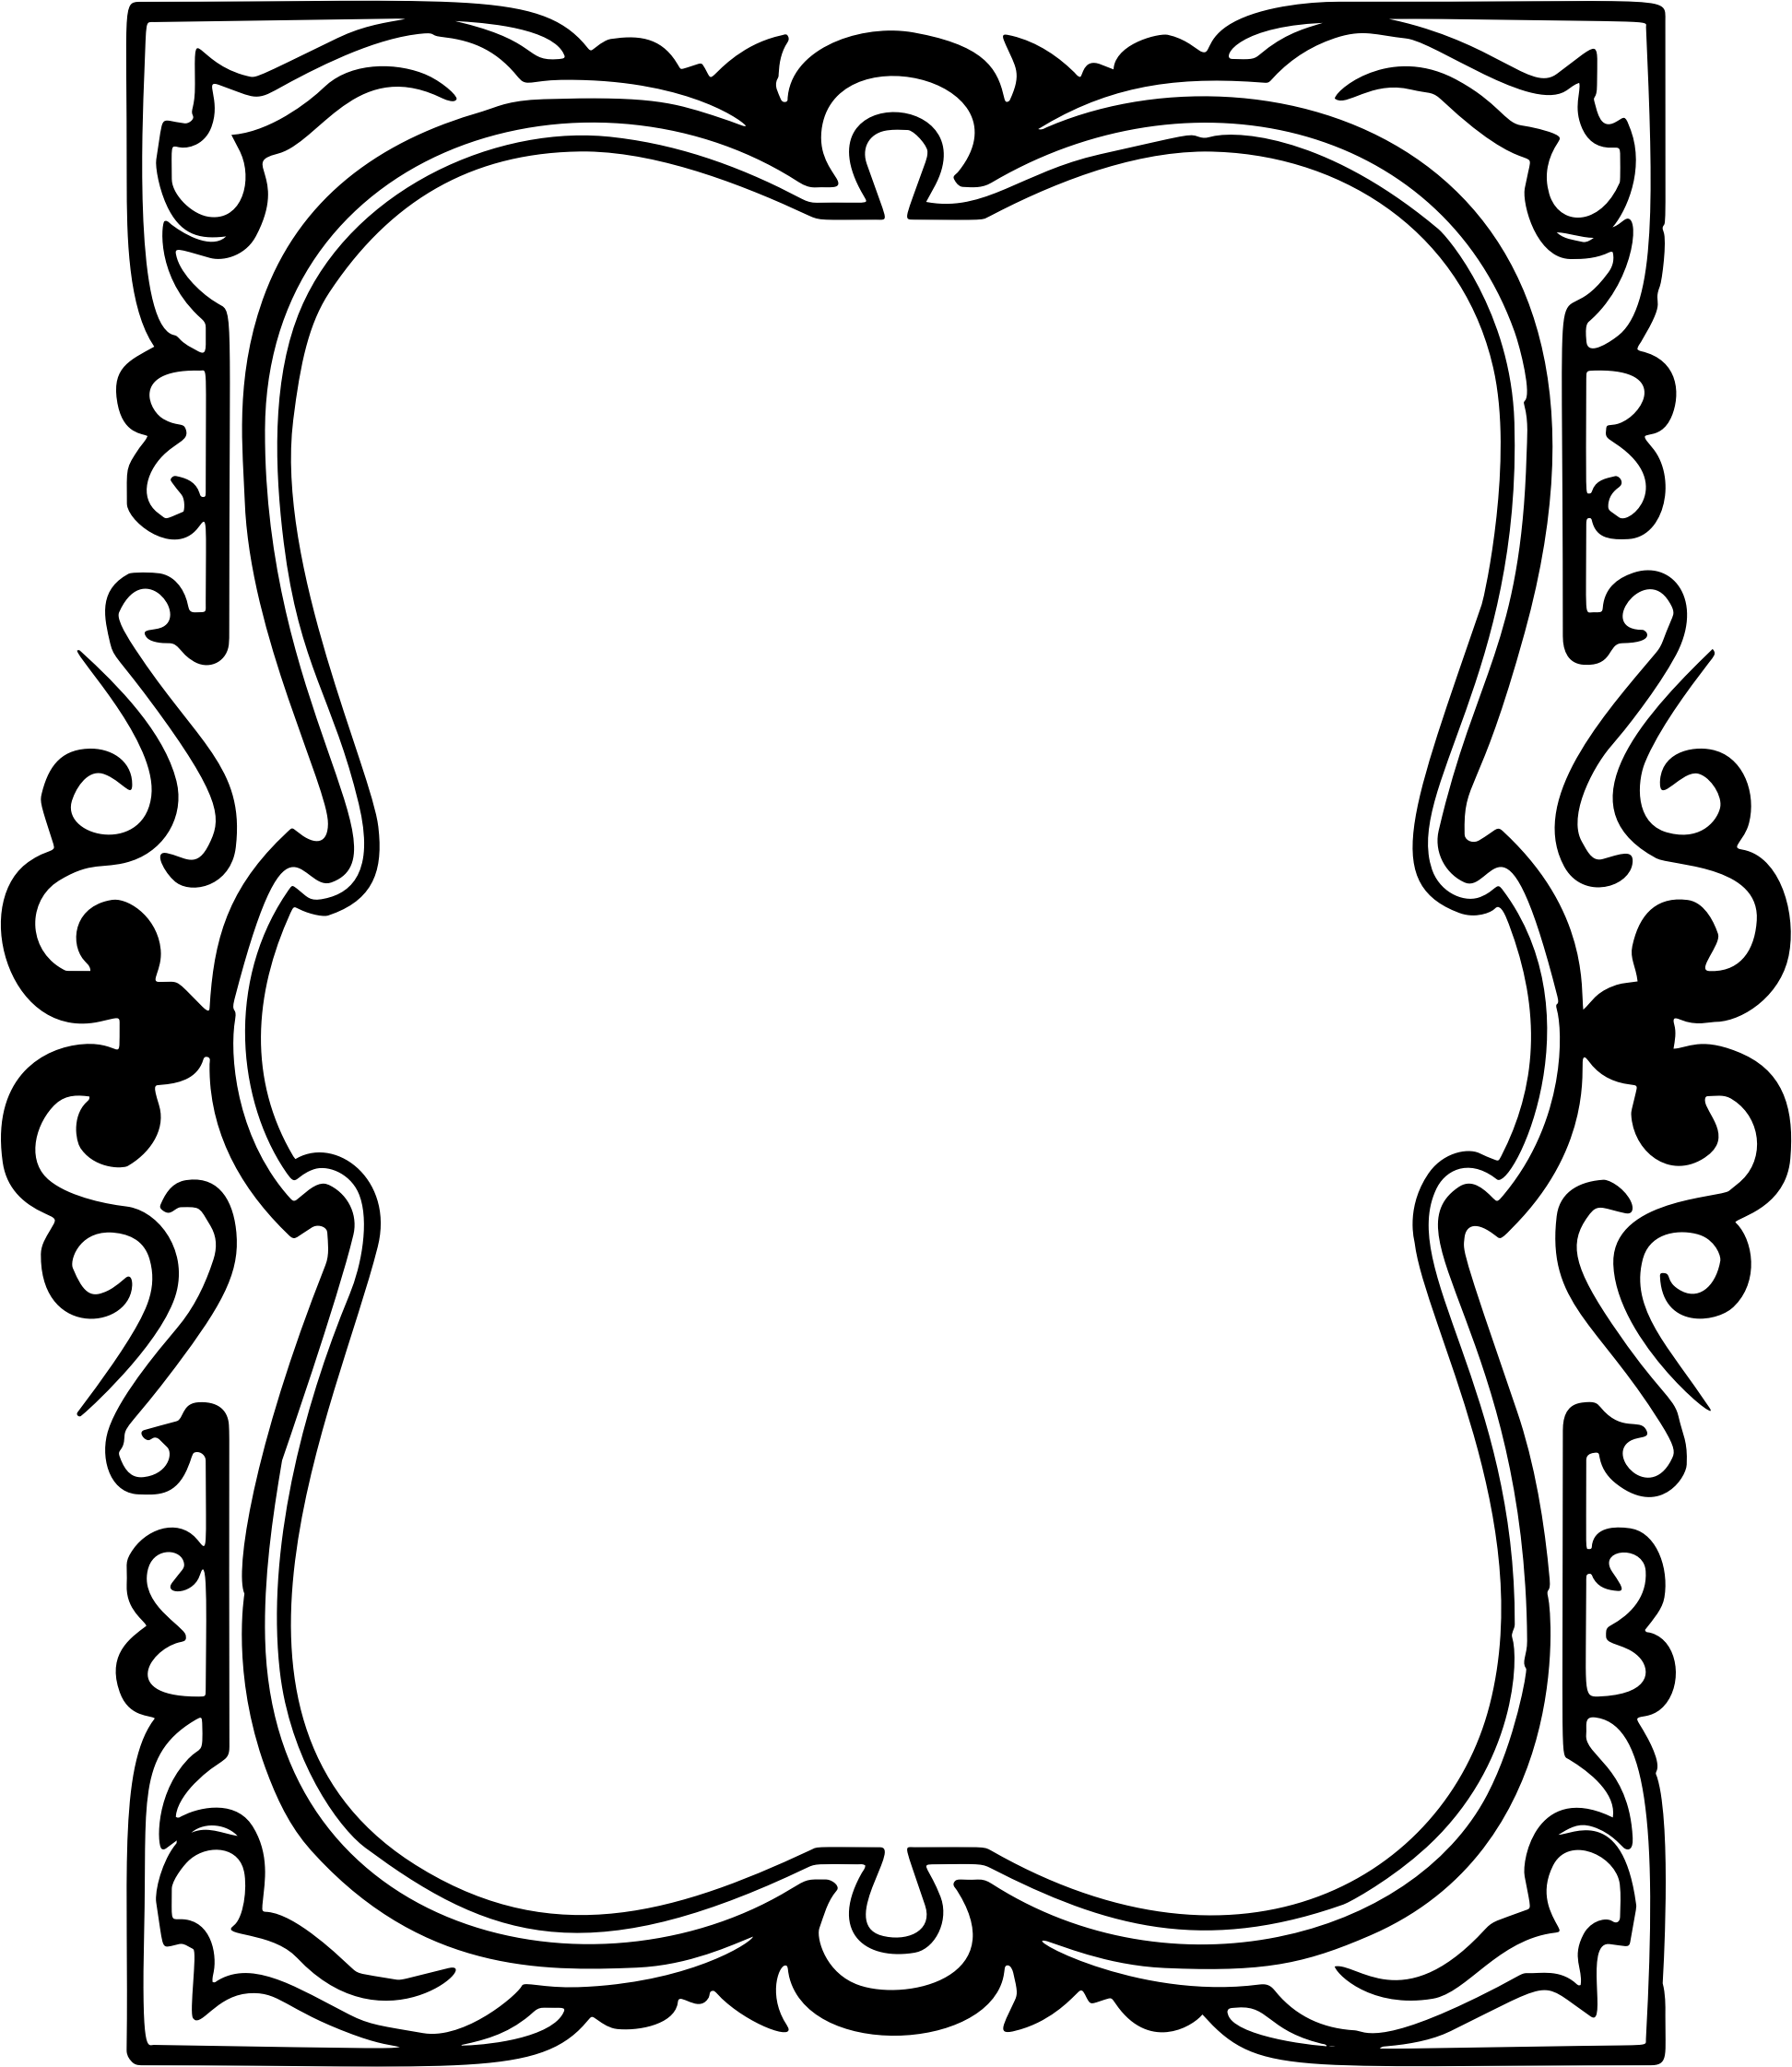 Clipart frame hand. Drawn ornamental big image